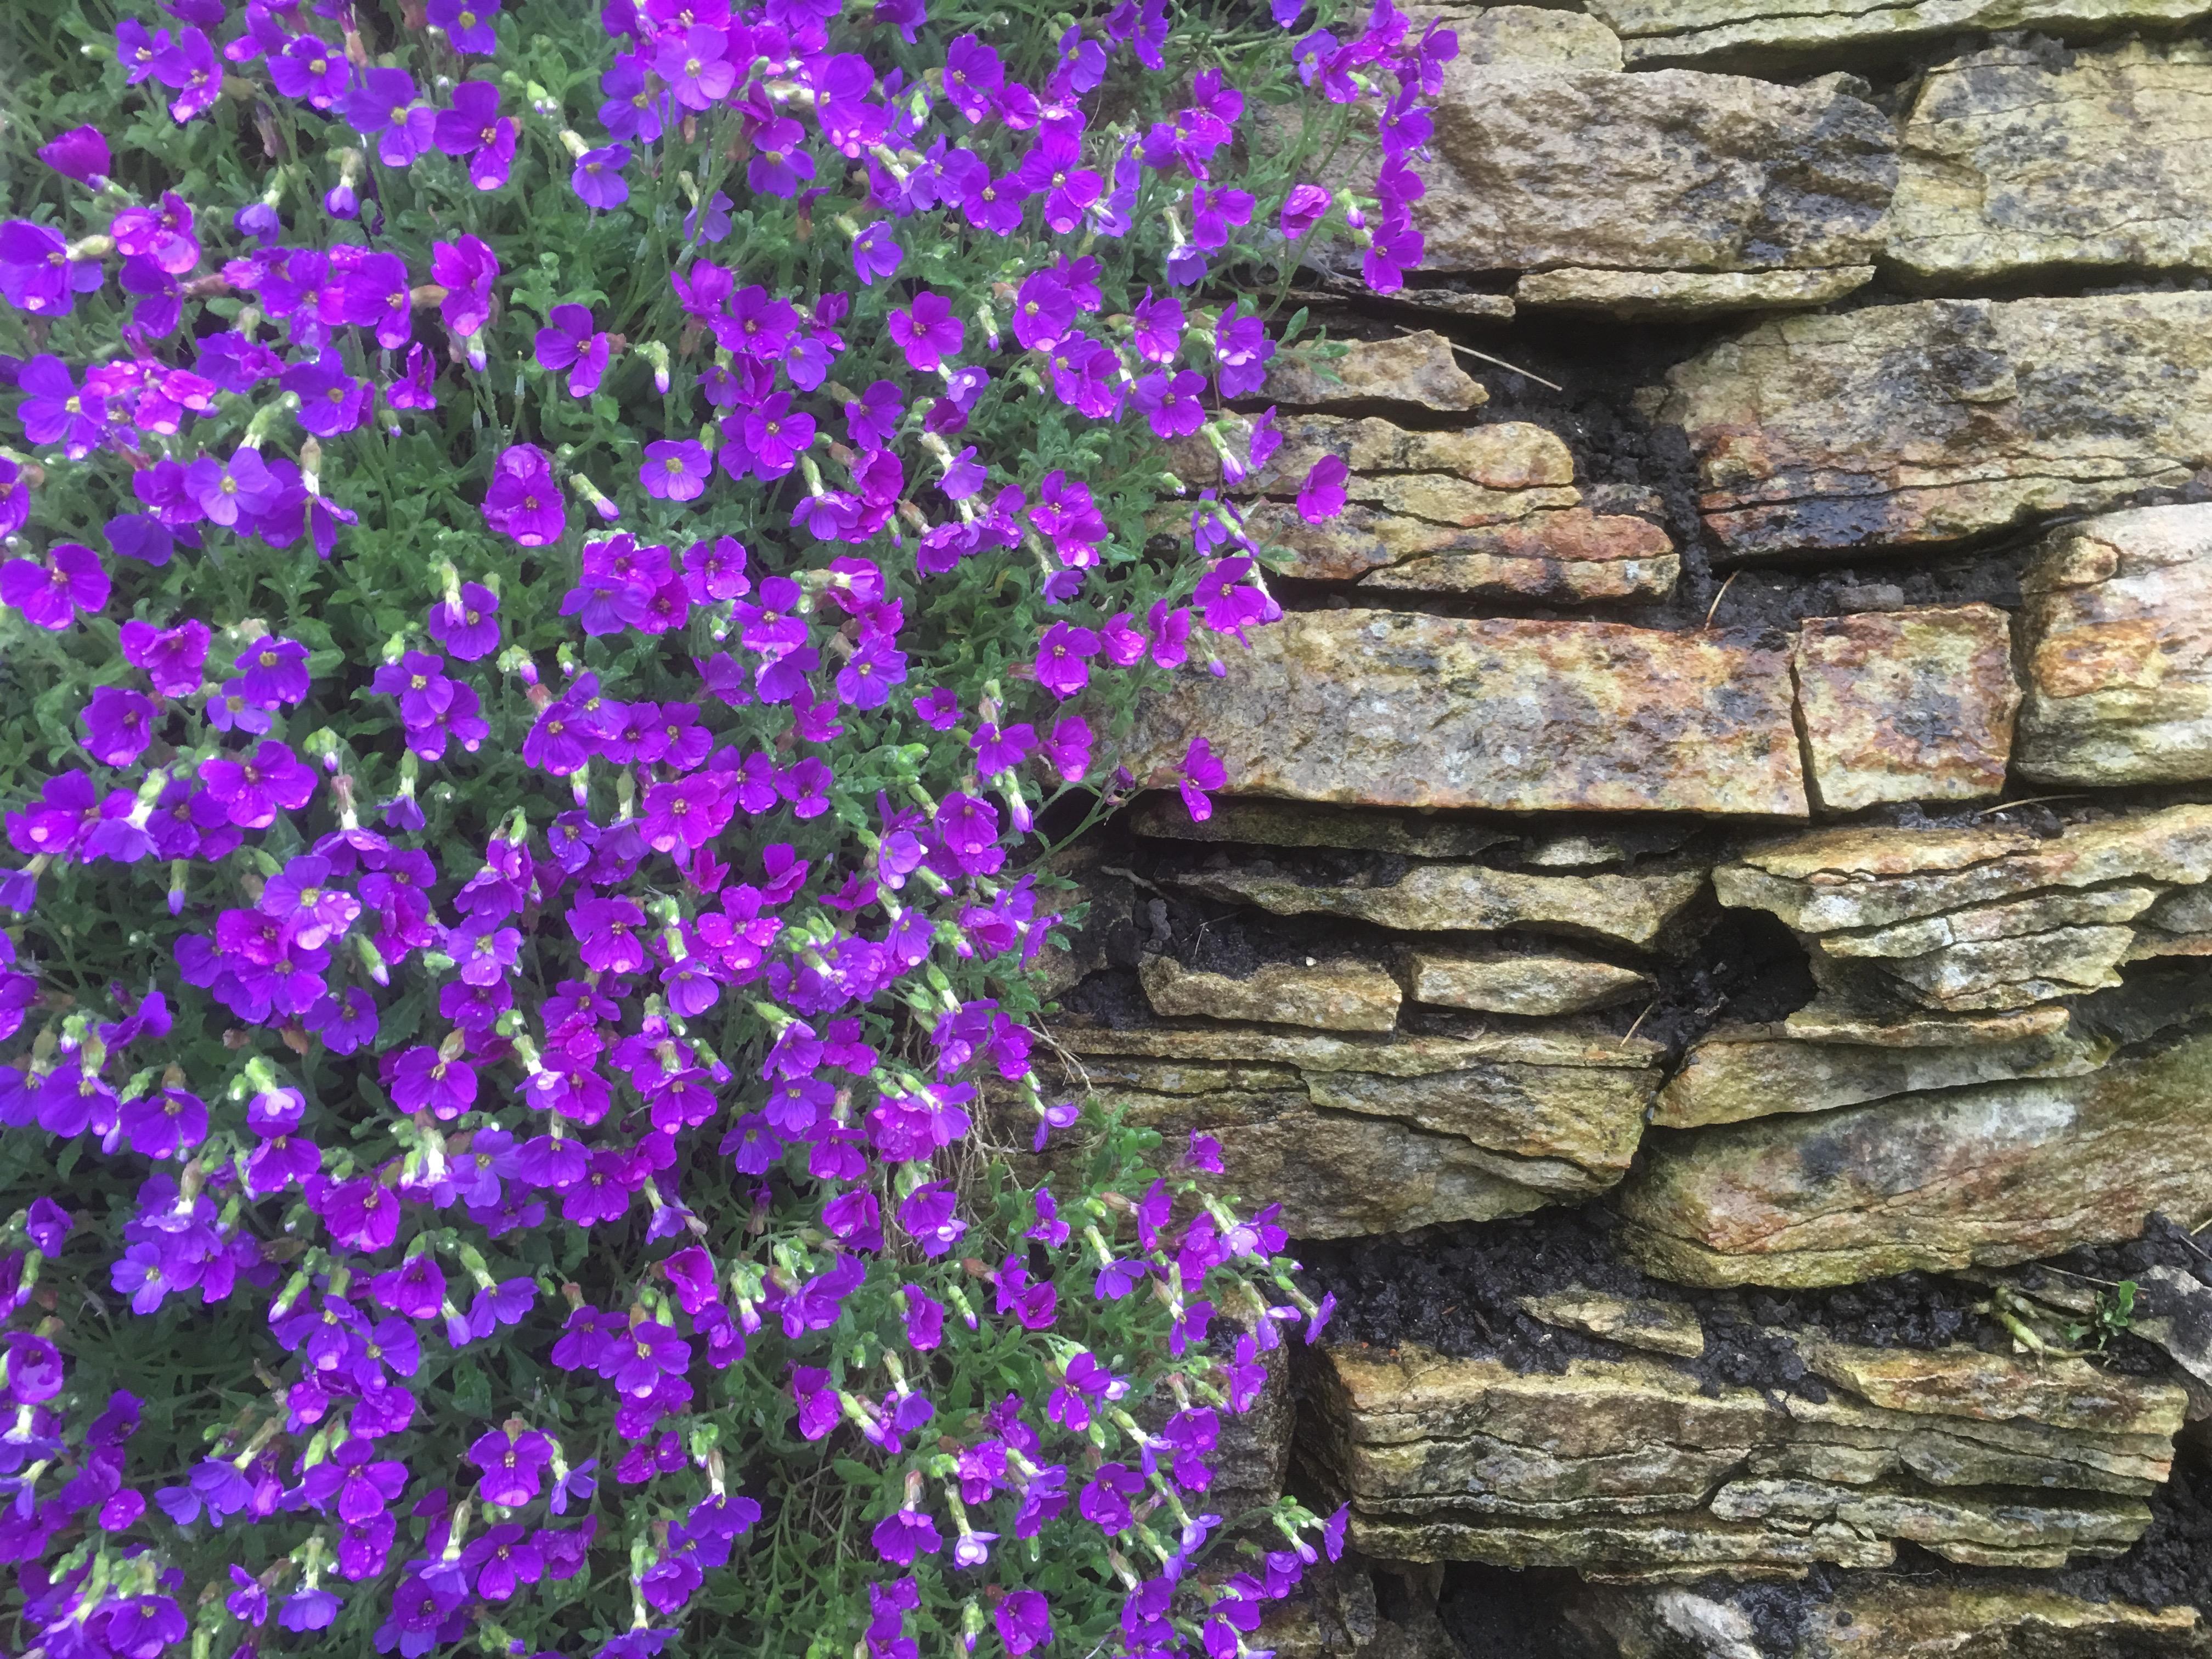 Aubretia on the Patio Wall